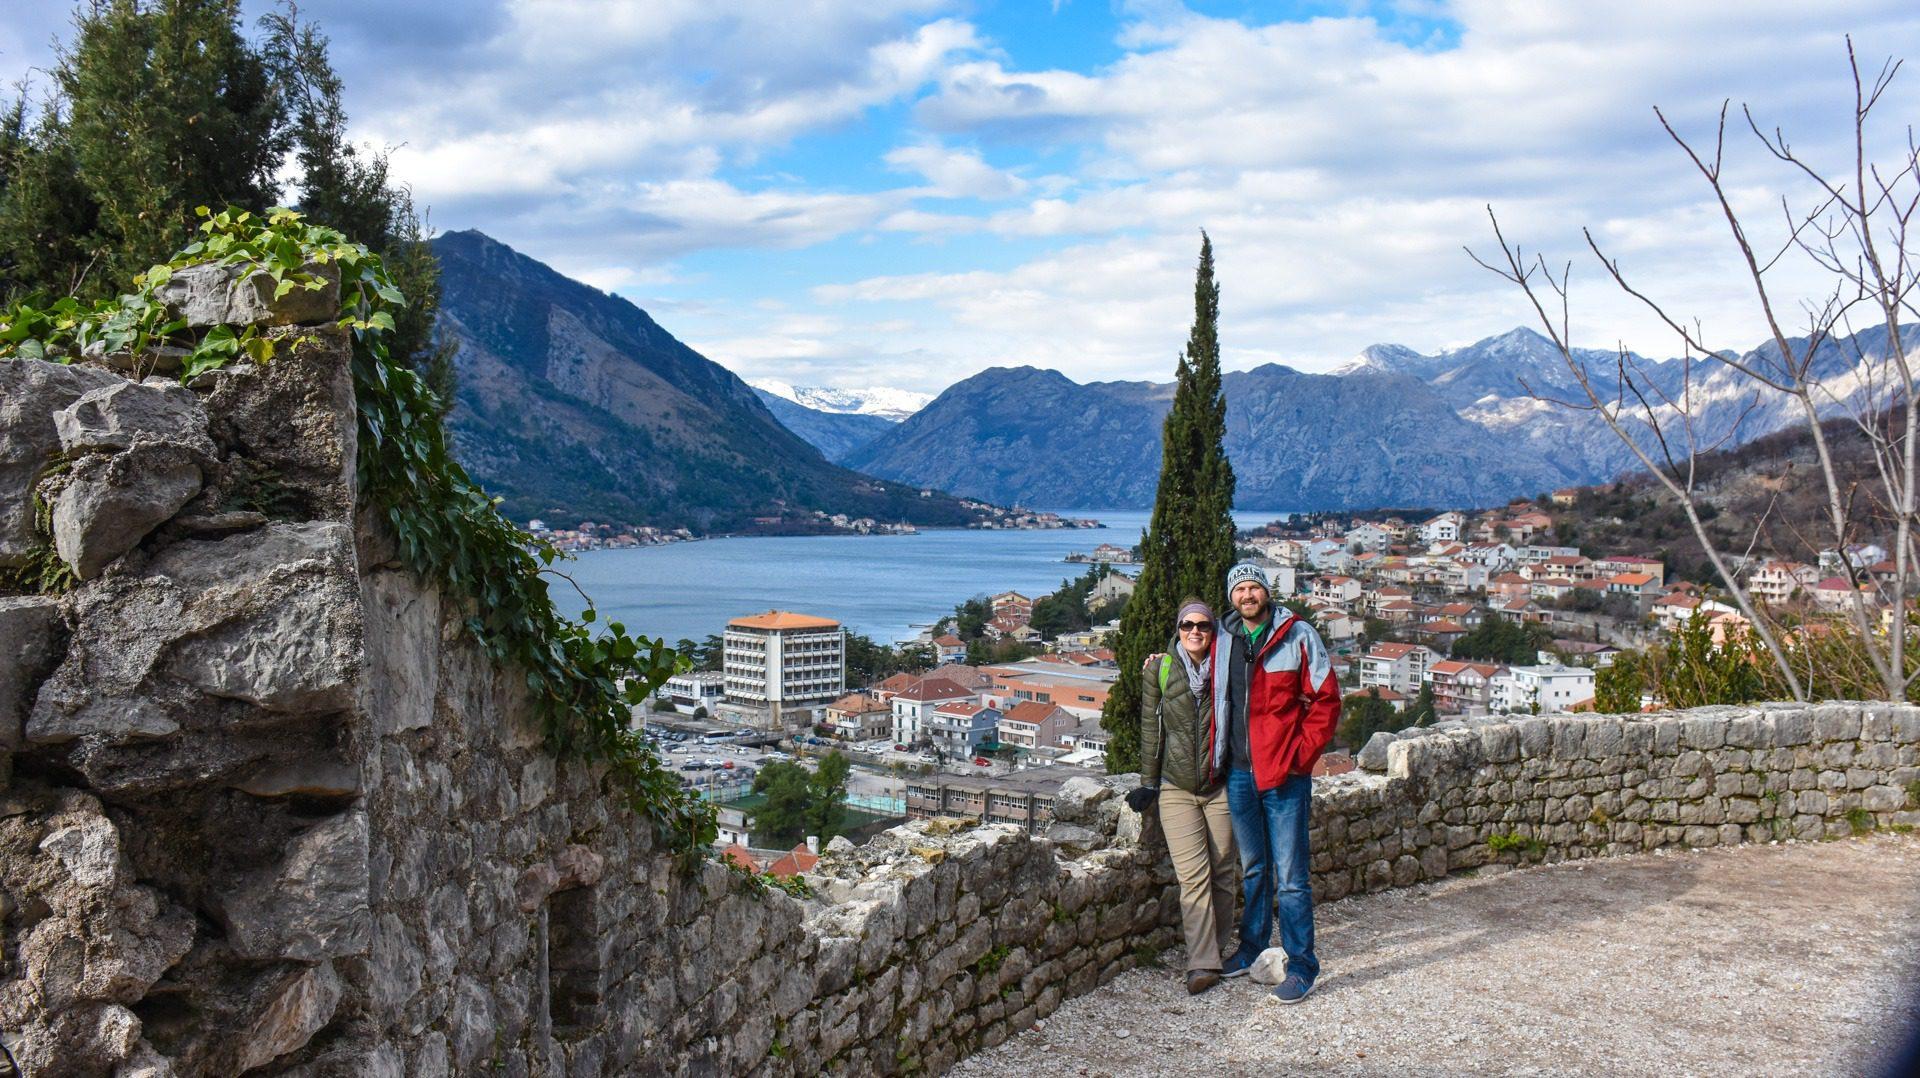 Exploring beautiful Kotor, Montenegro.